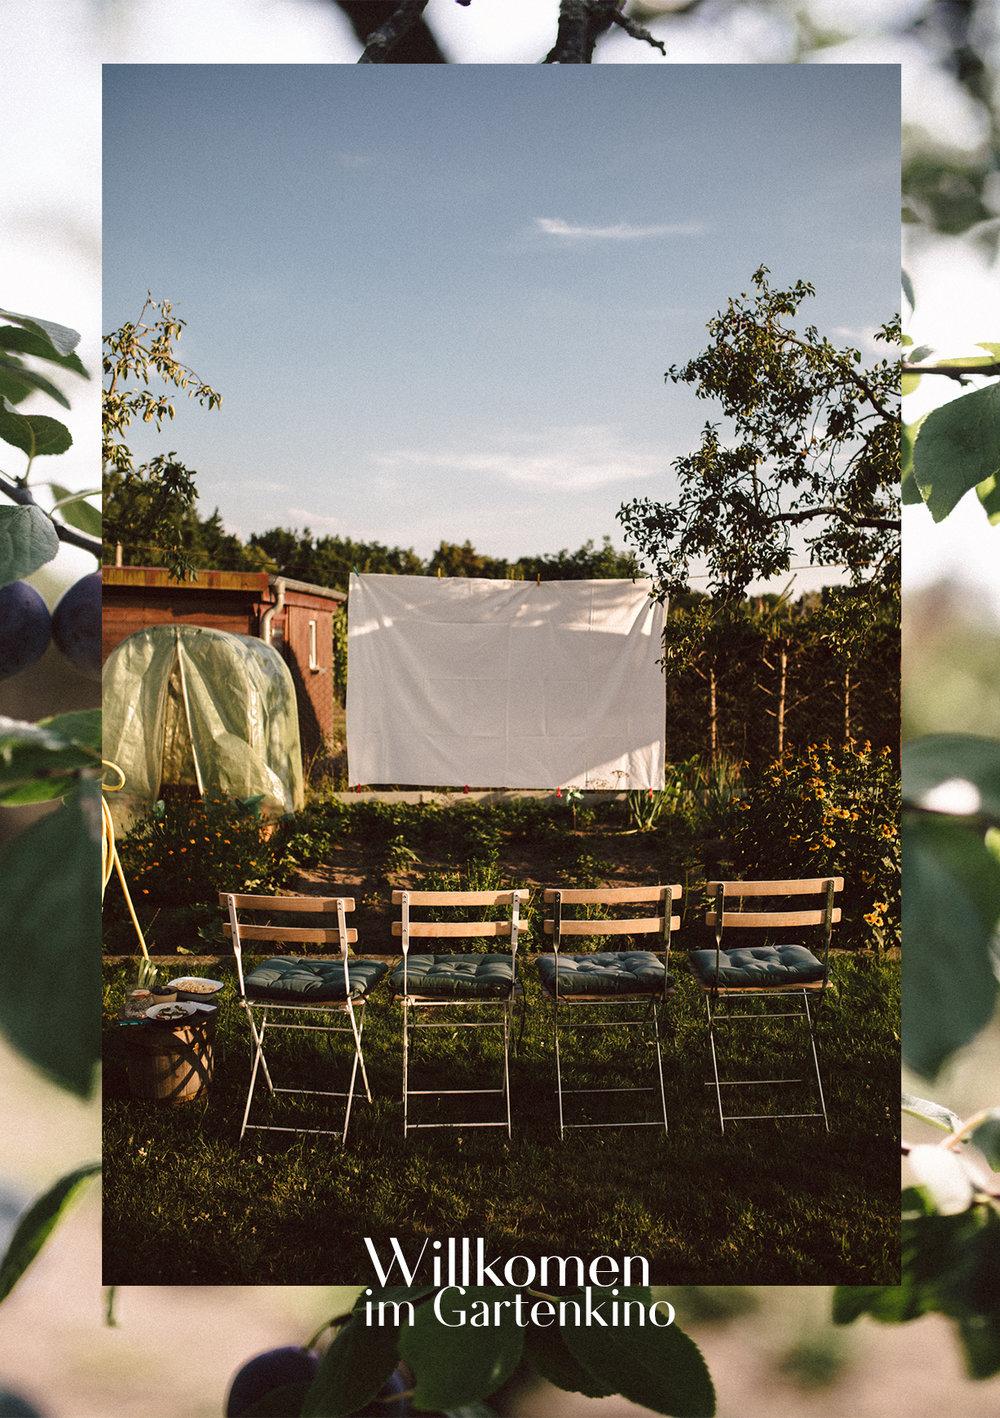 Willkommen im Gartenkino